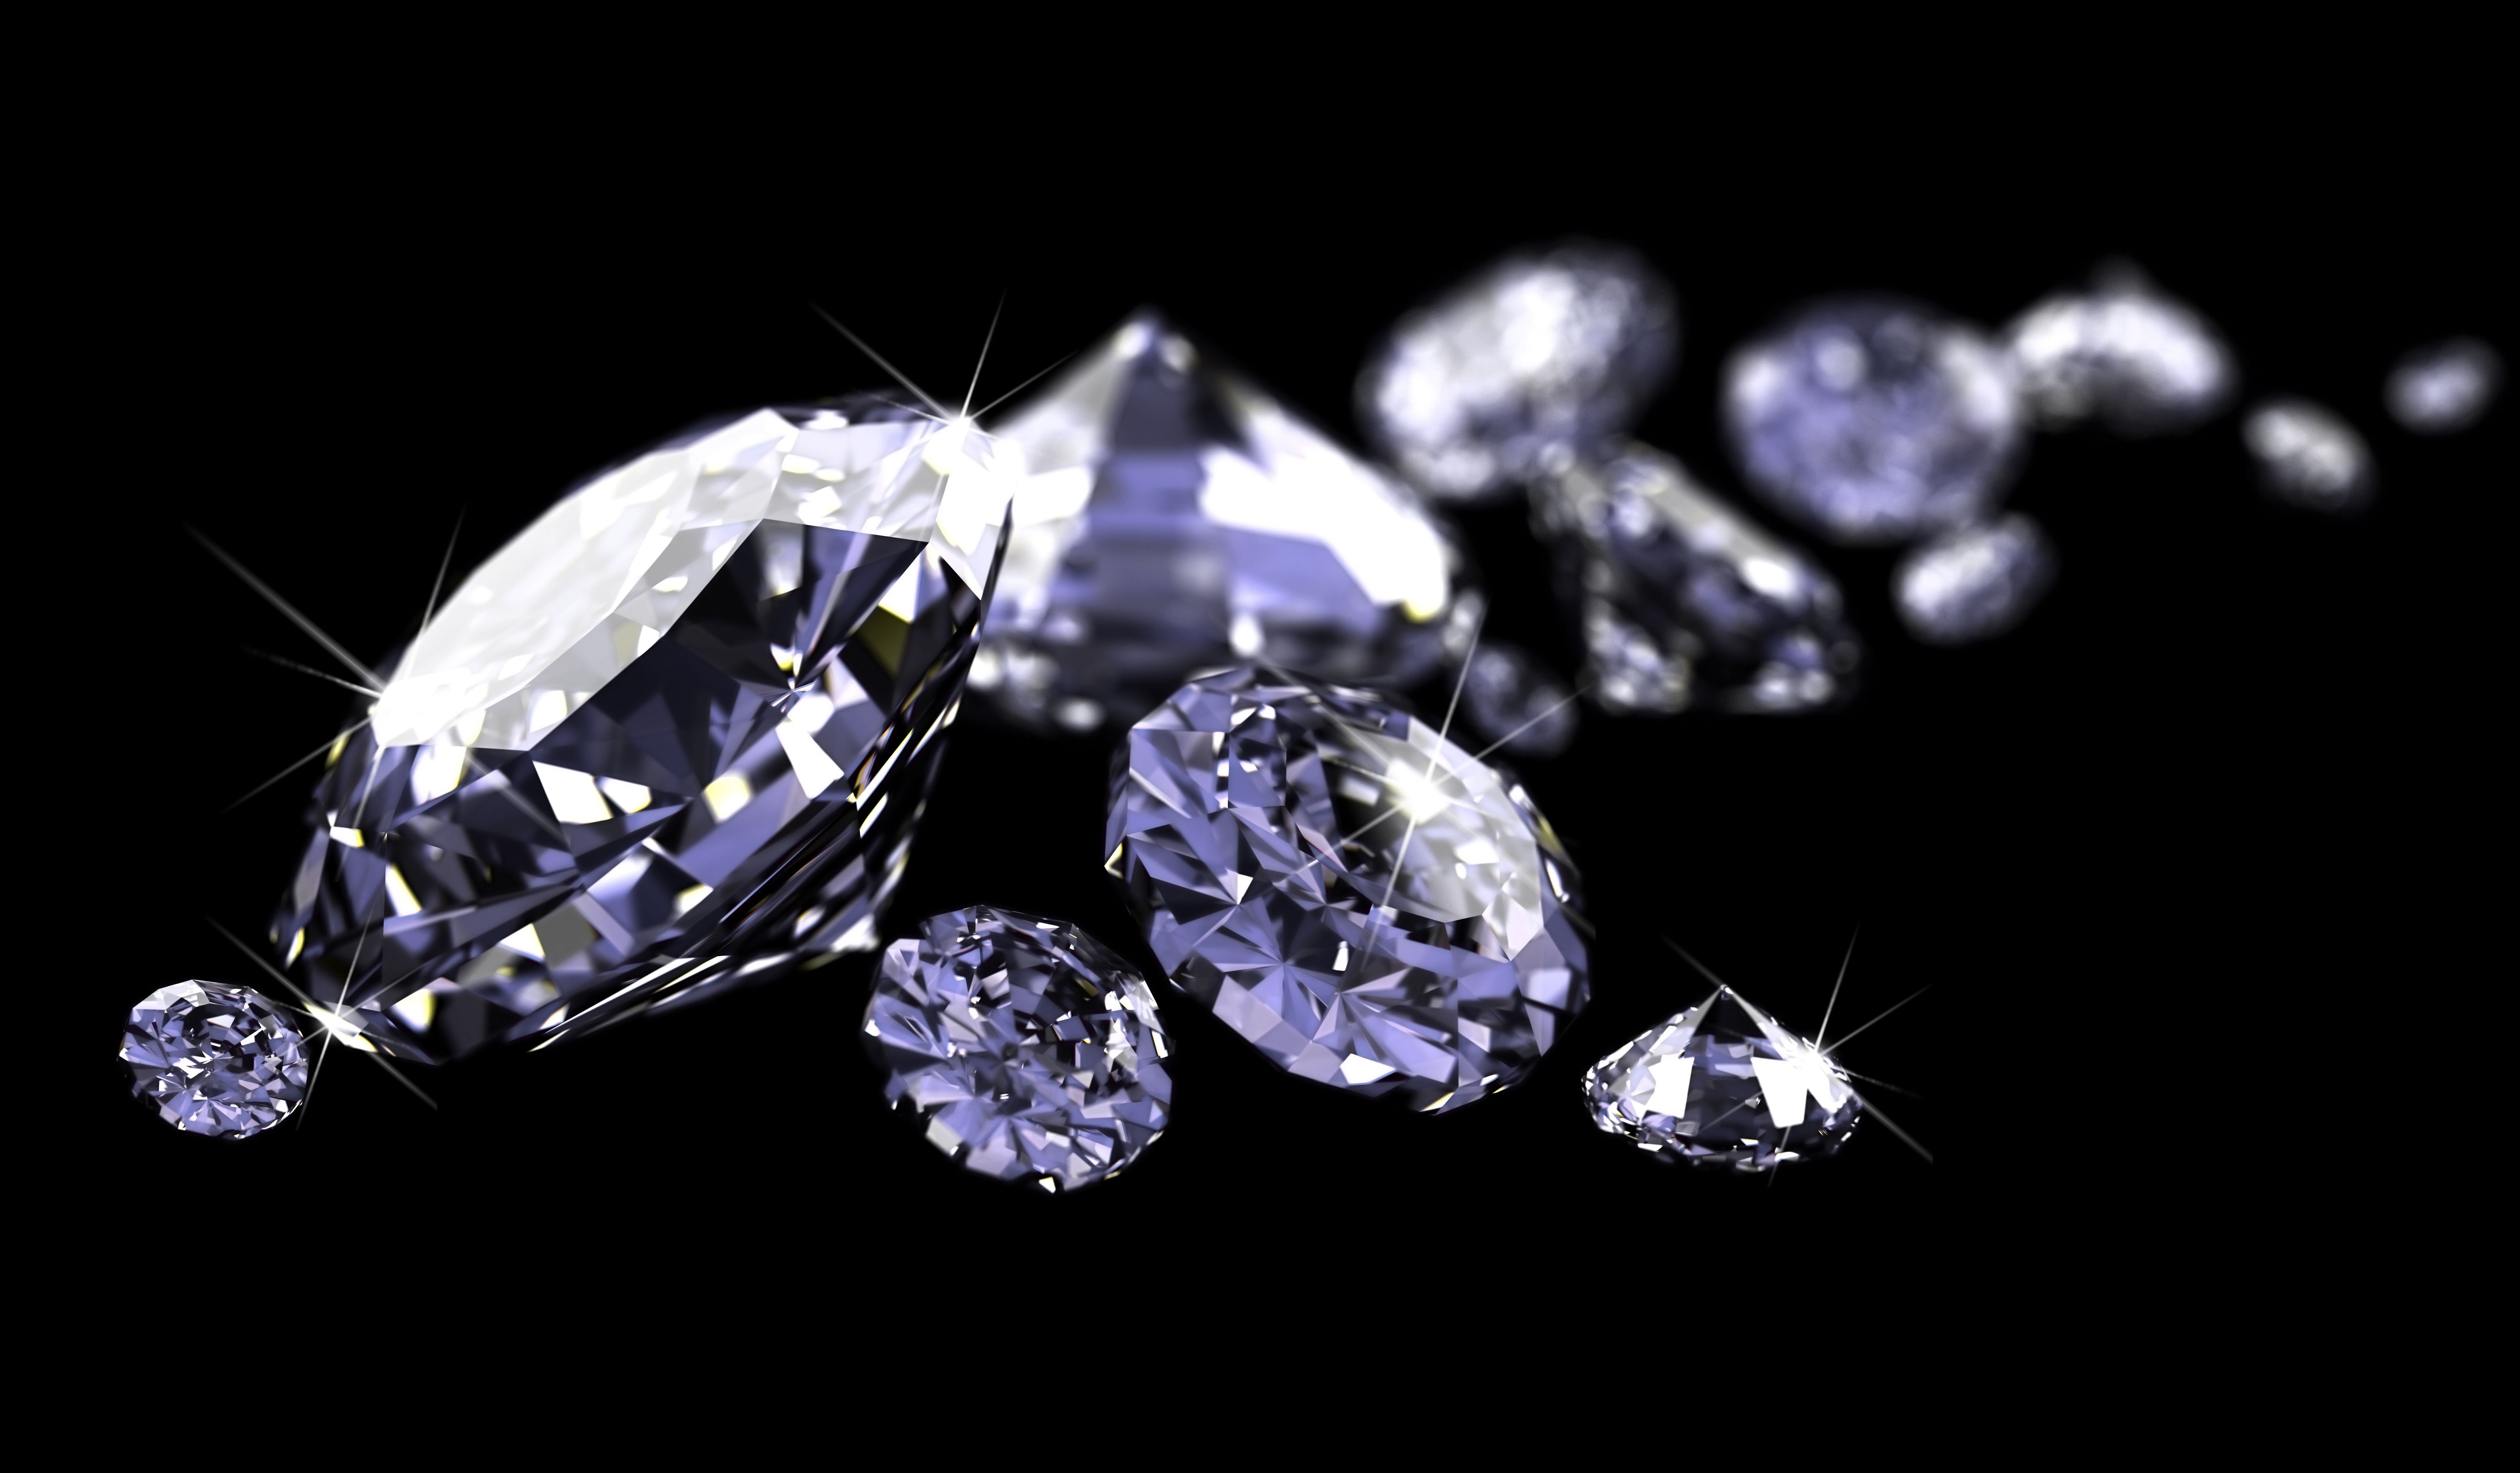 6228527 - diamonds on black surface